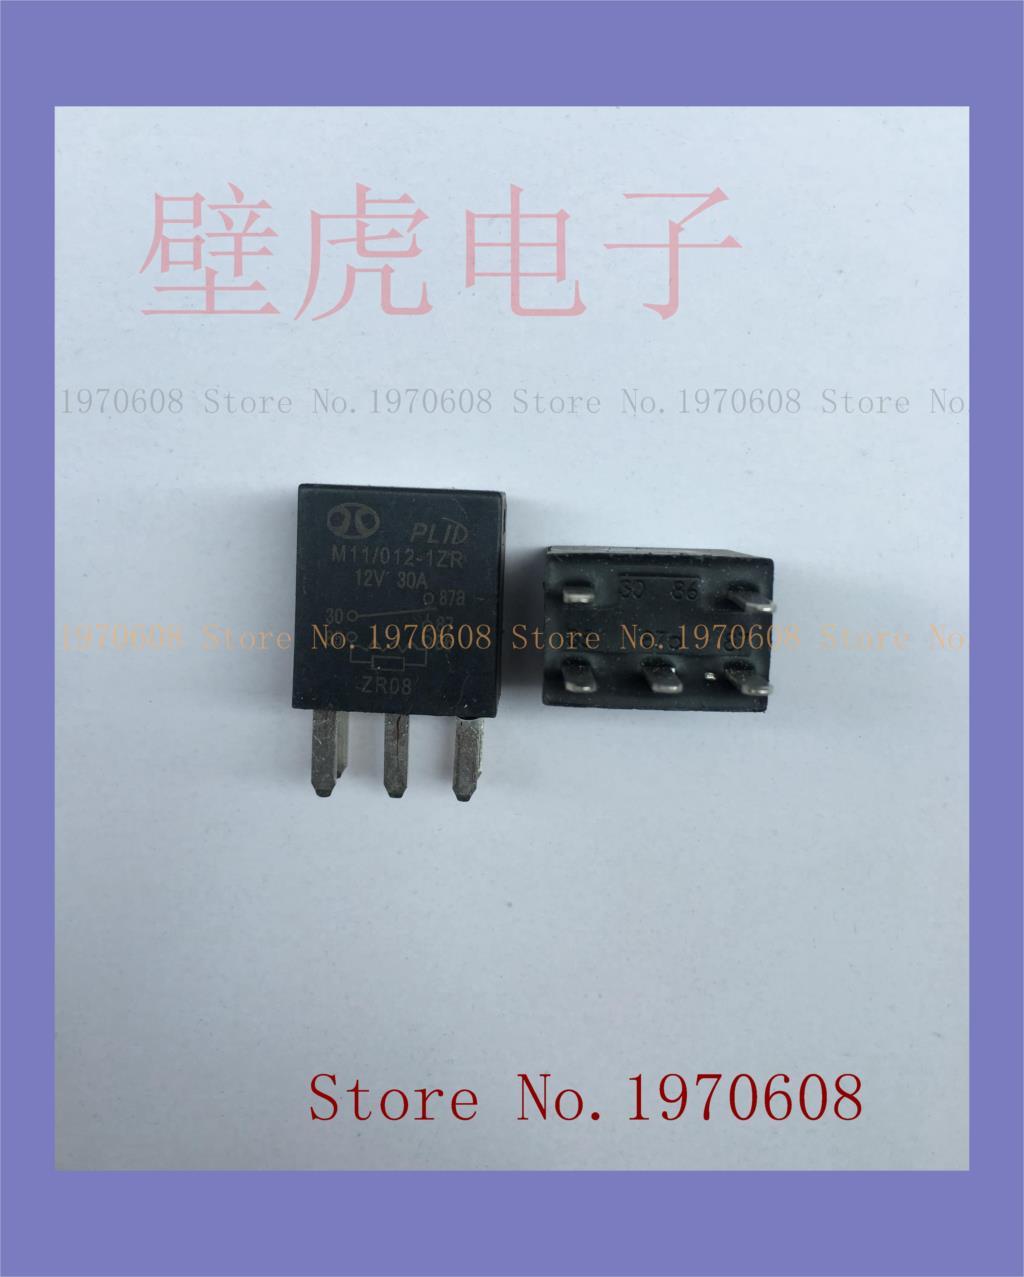 Relay M11/012-1ZR